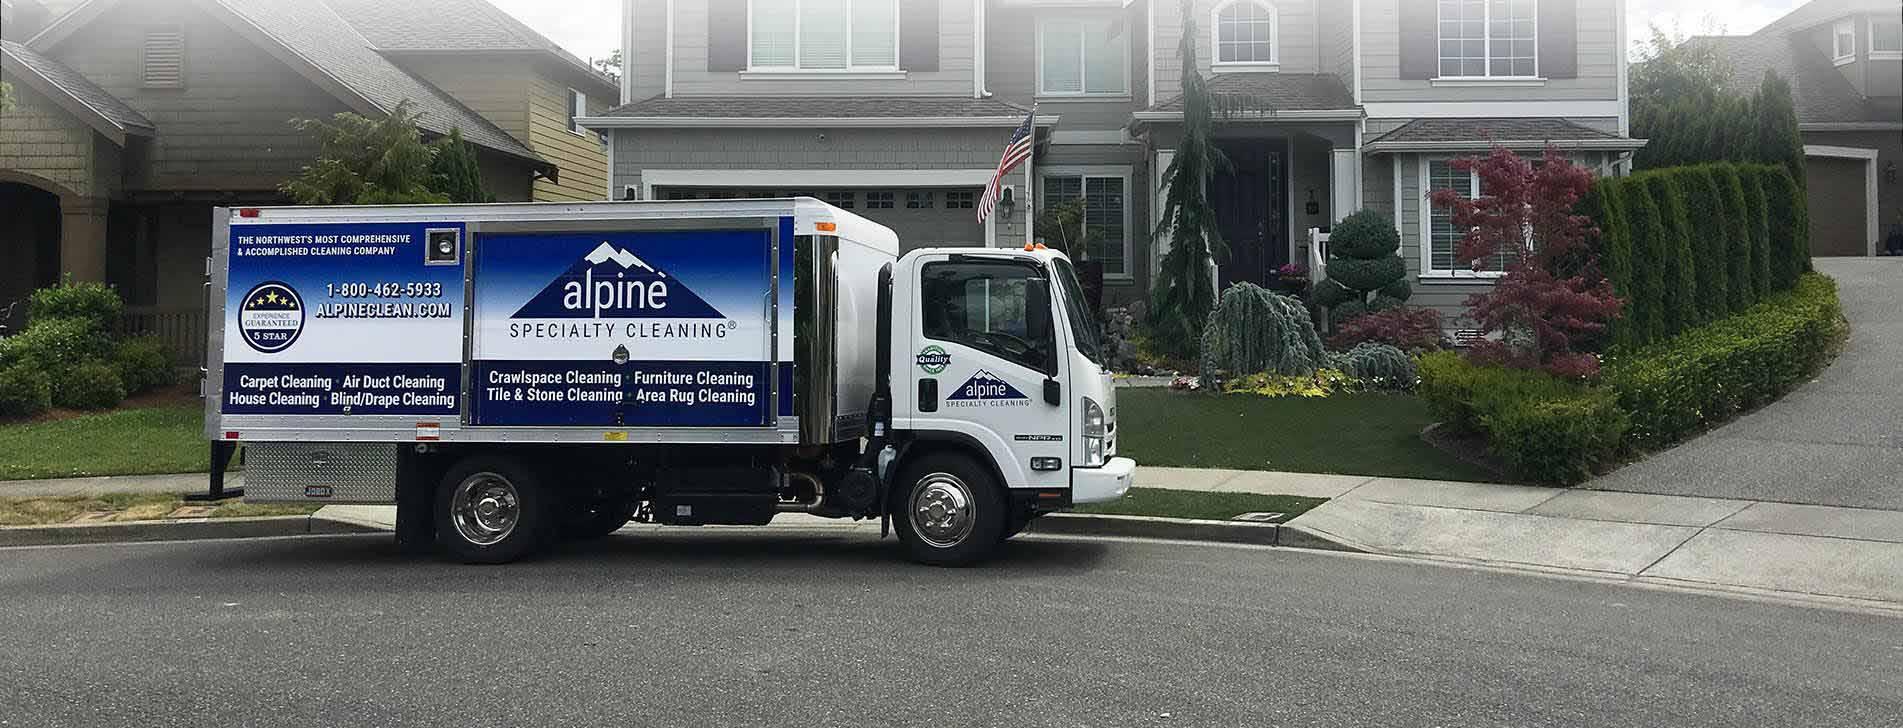 Ultra-Premium Carpet Cleaning Truck Seattle